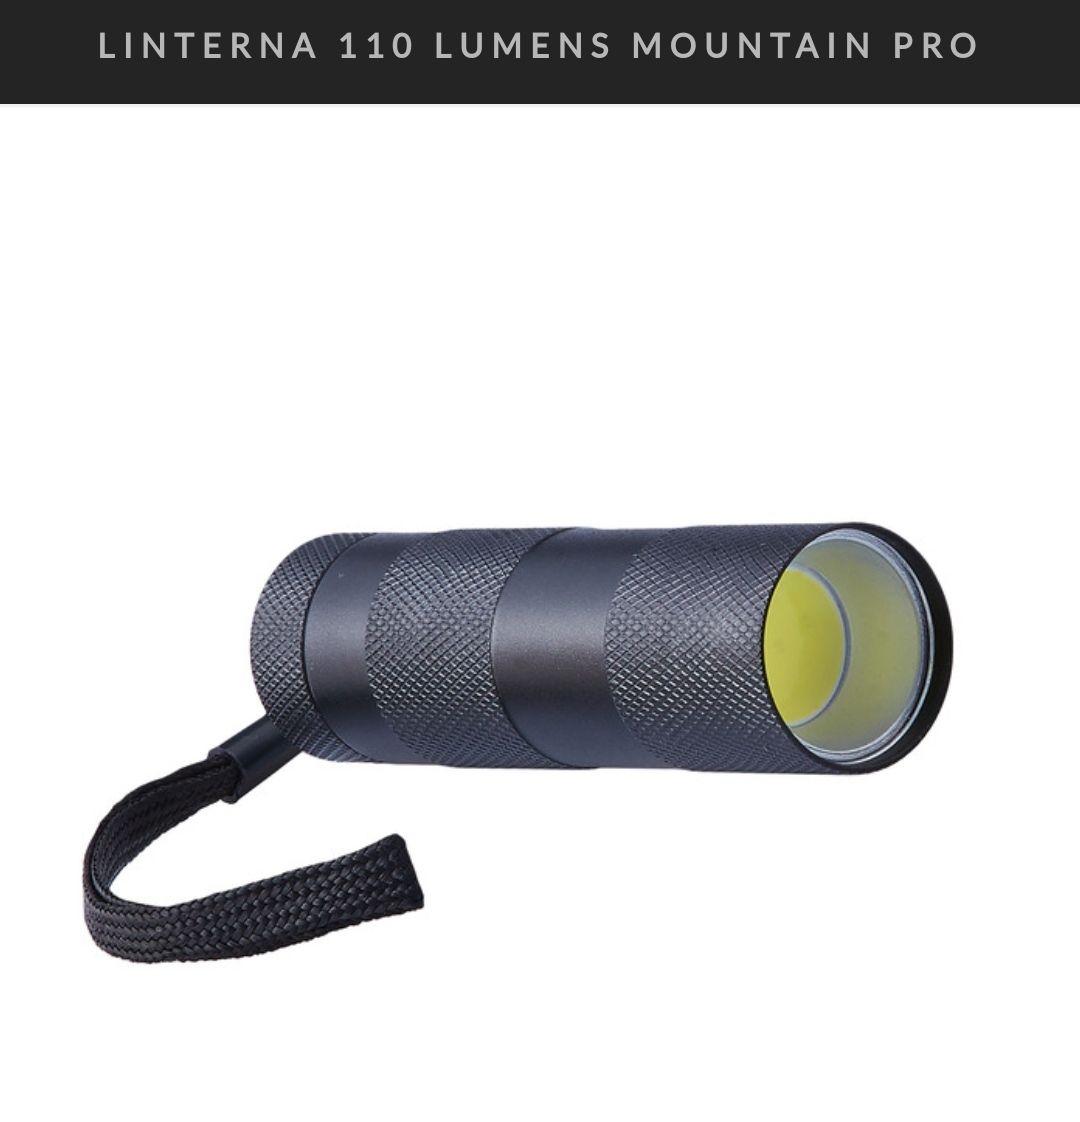 Linterna 110 Lumens Mountain PRO